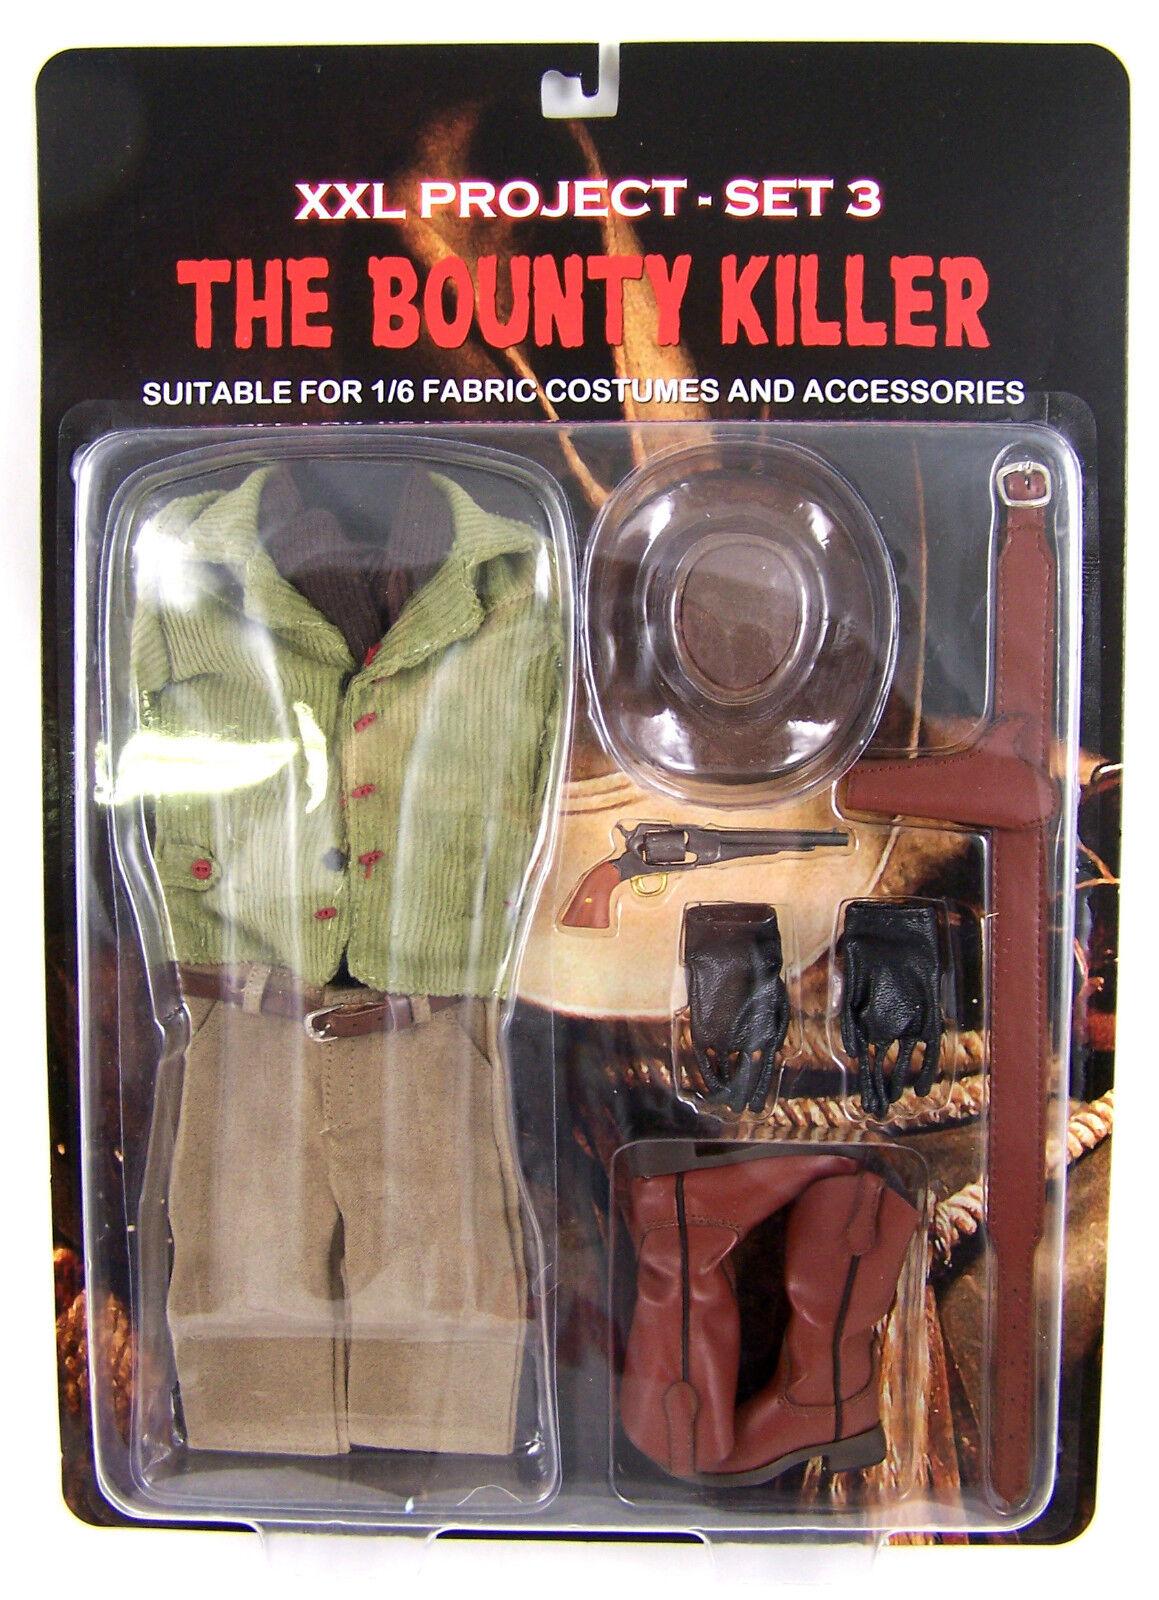 Kaustic Plastik clothing The Bounty Killer clothing Plastik and accessories set KP-XXL03 8253a6